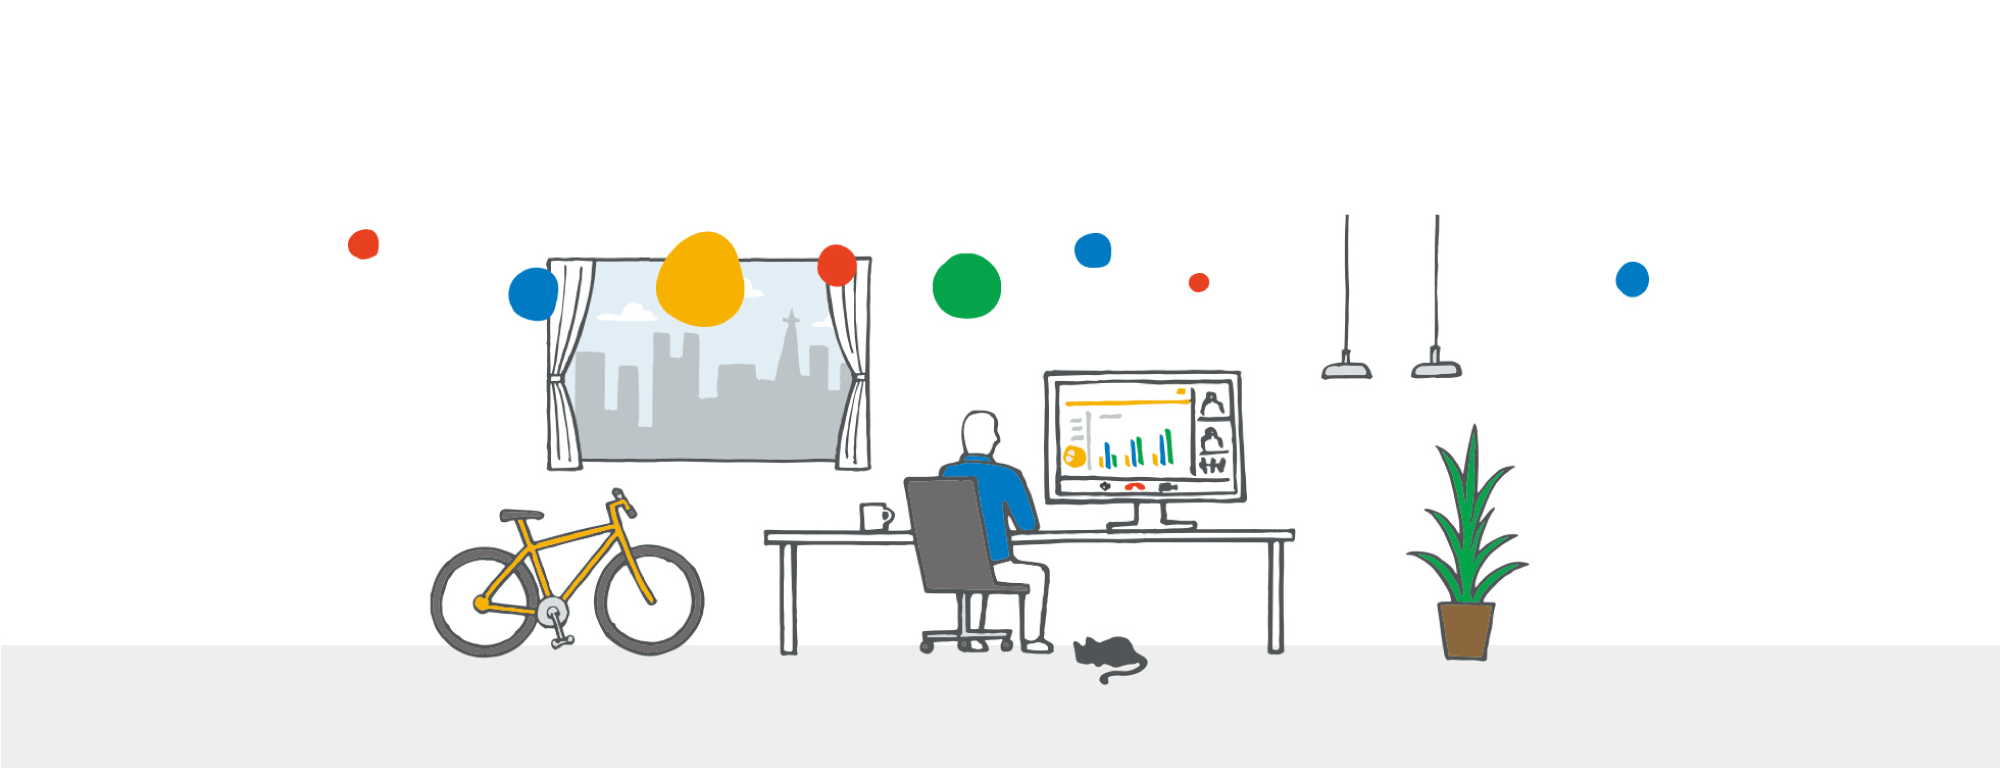 Google Meet でまずはテレビ会議(個人向け)